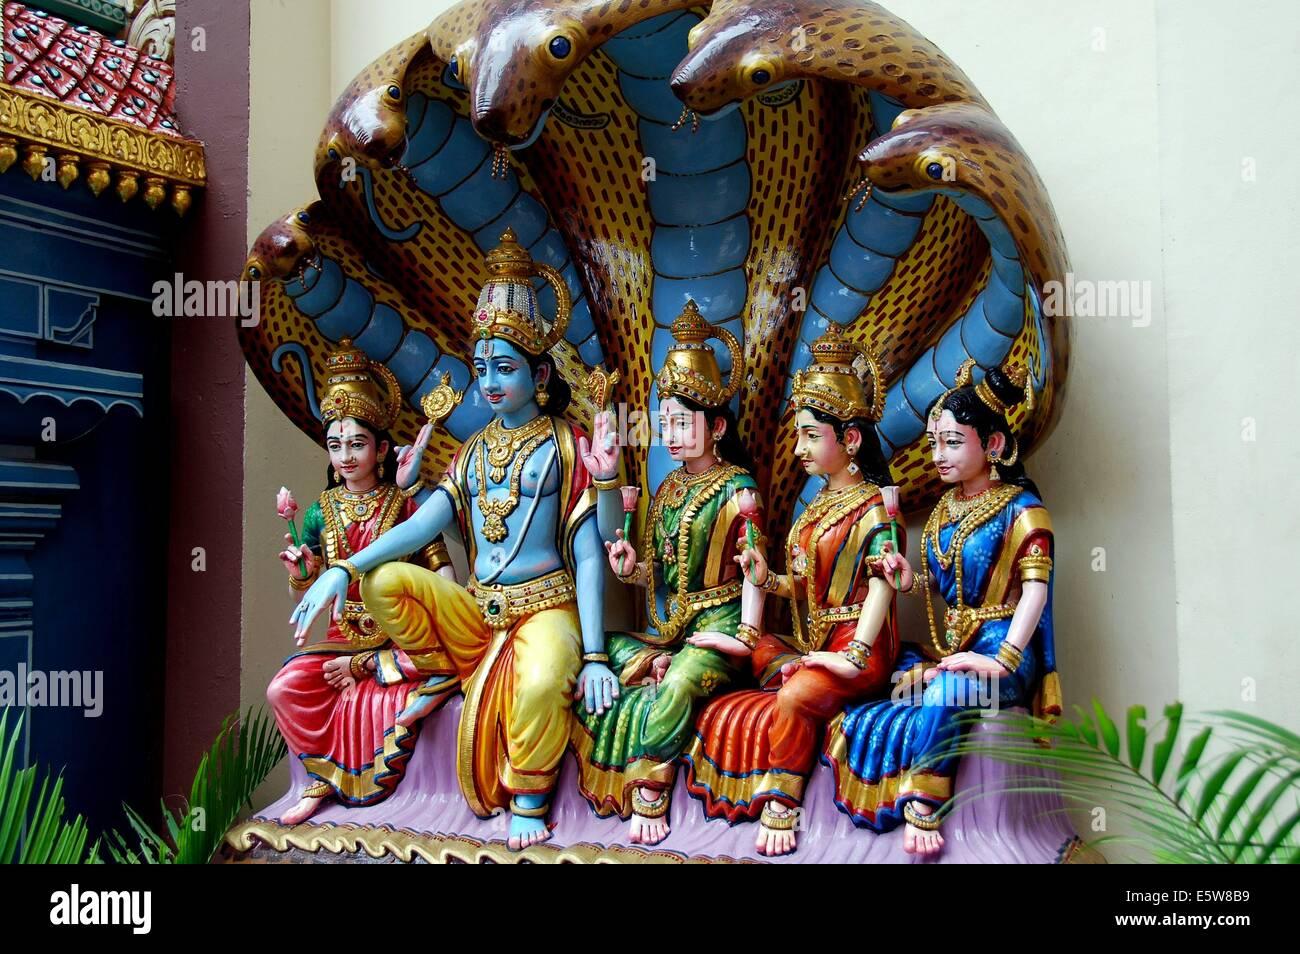 SINGAPORE: Colourful Hindu deities at the Sri Krishan temple on the Albert Mall * - Stock Image